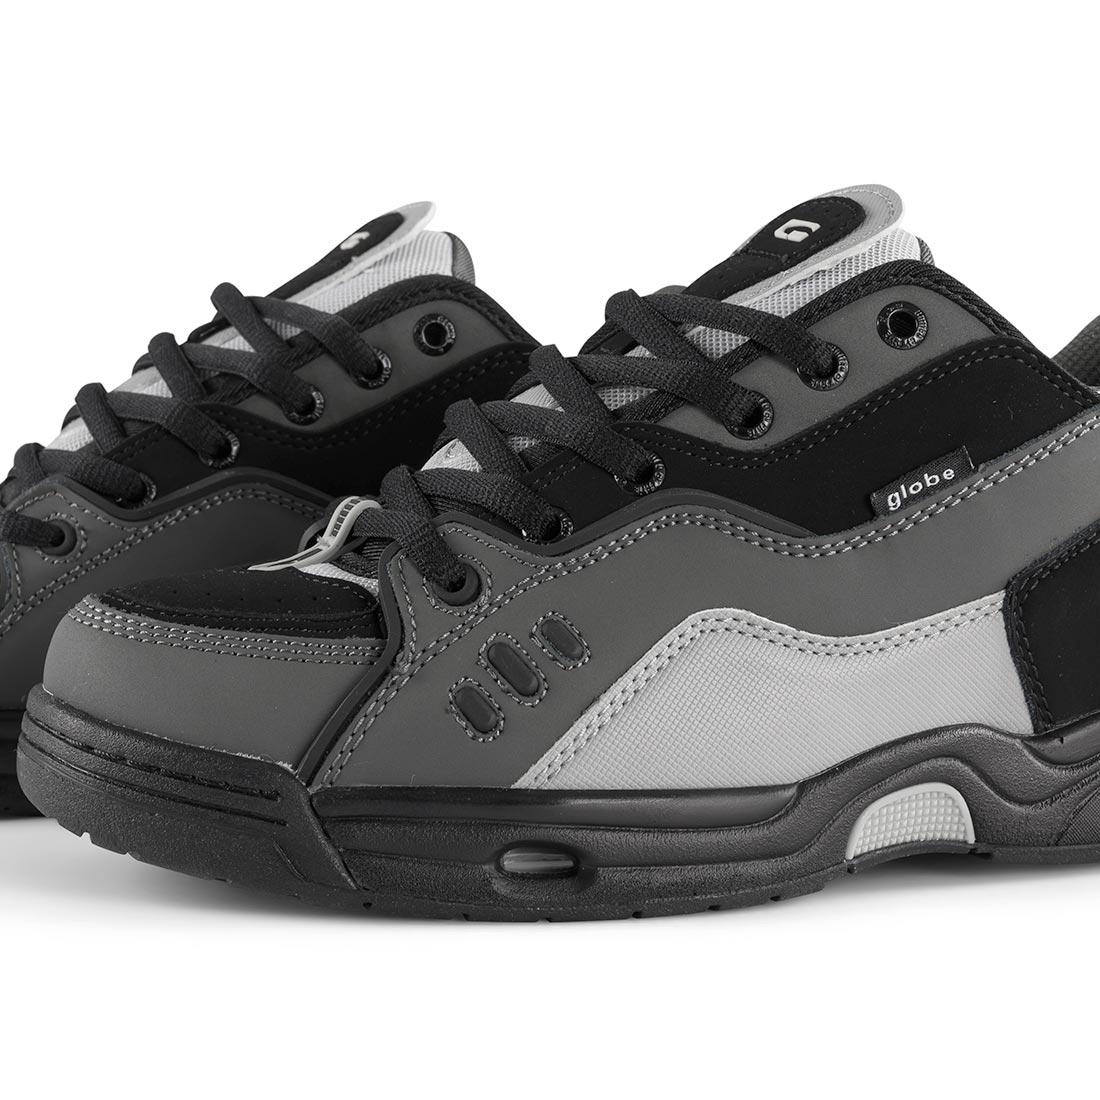 Globe CT-IV Classic Shoes – Battleship / Black